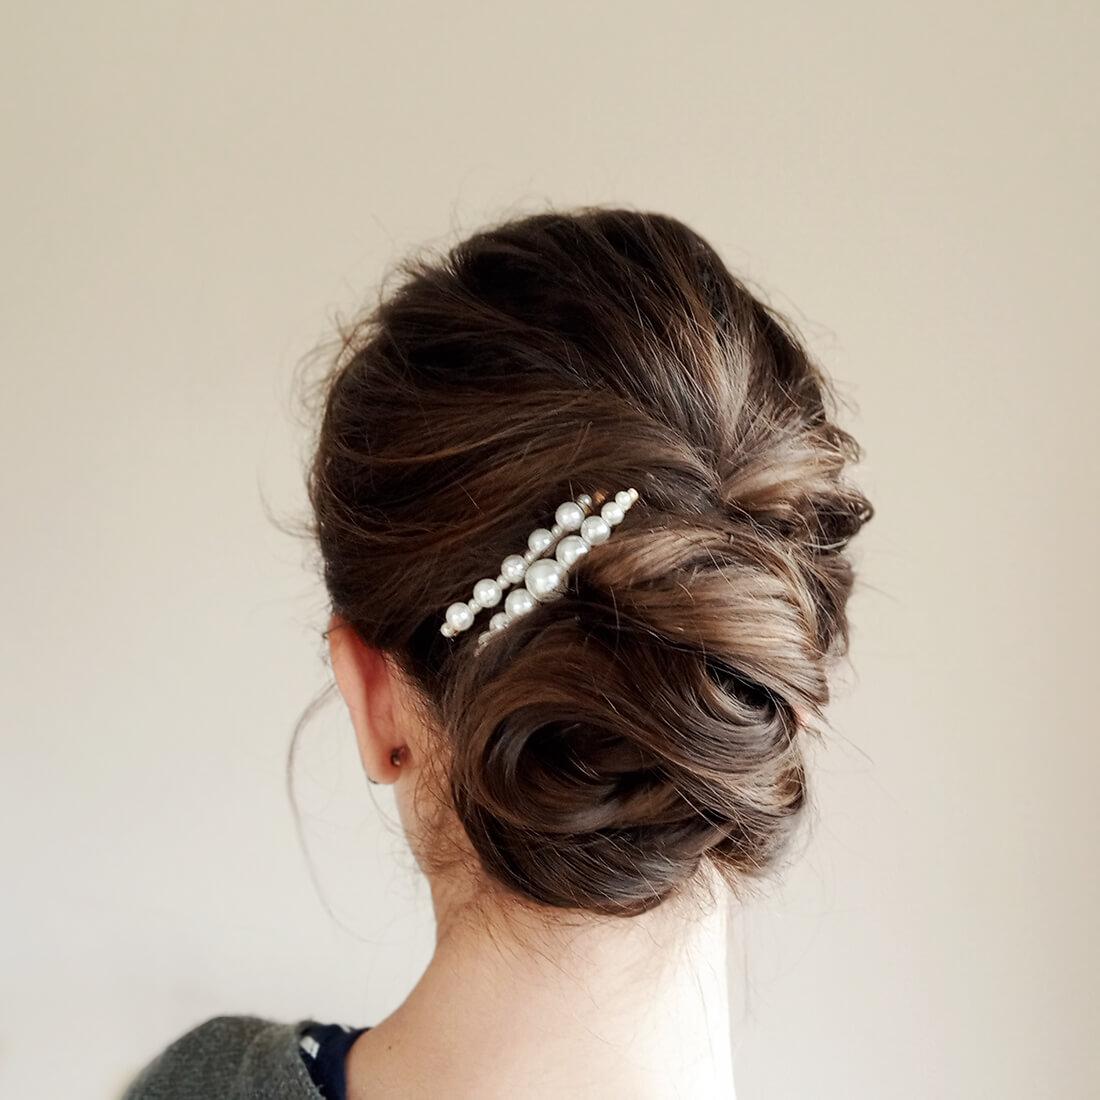 nízký drdol s perlami